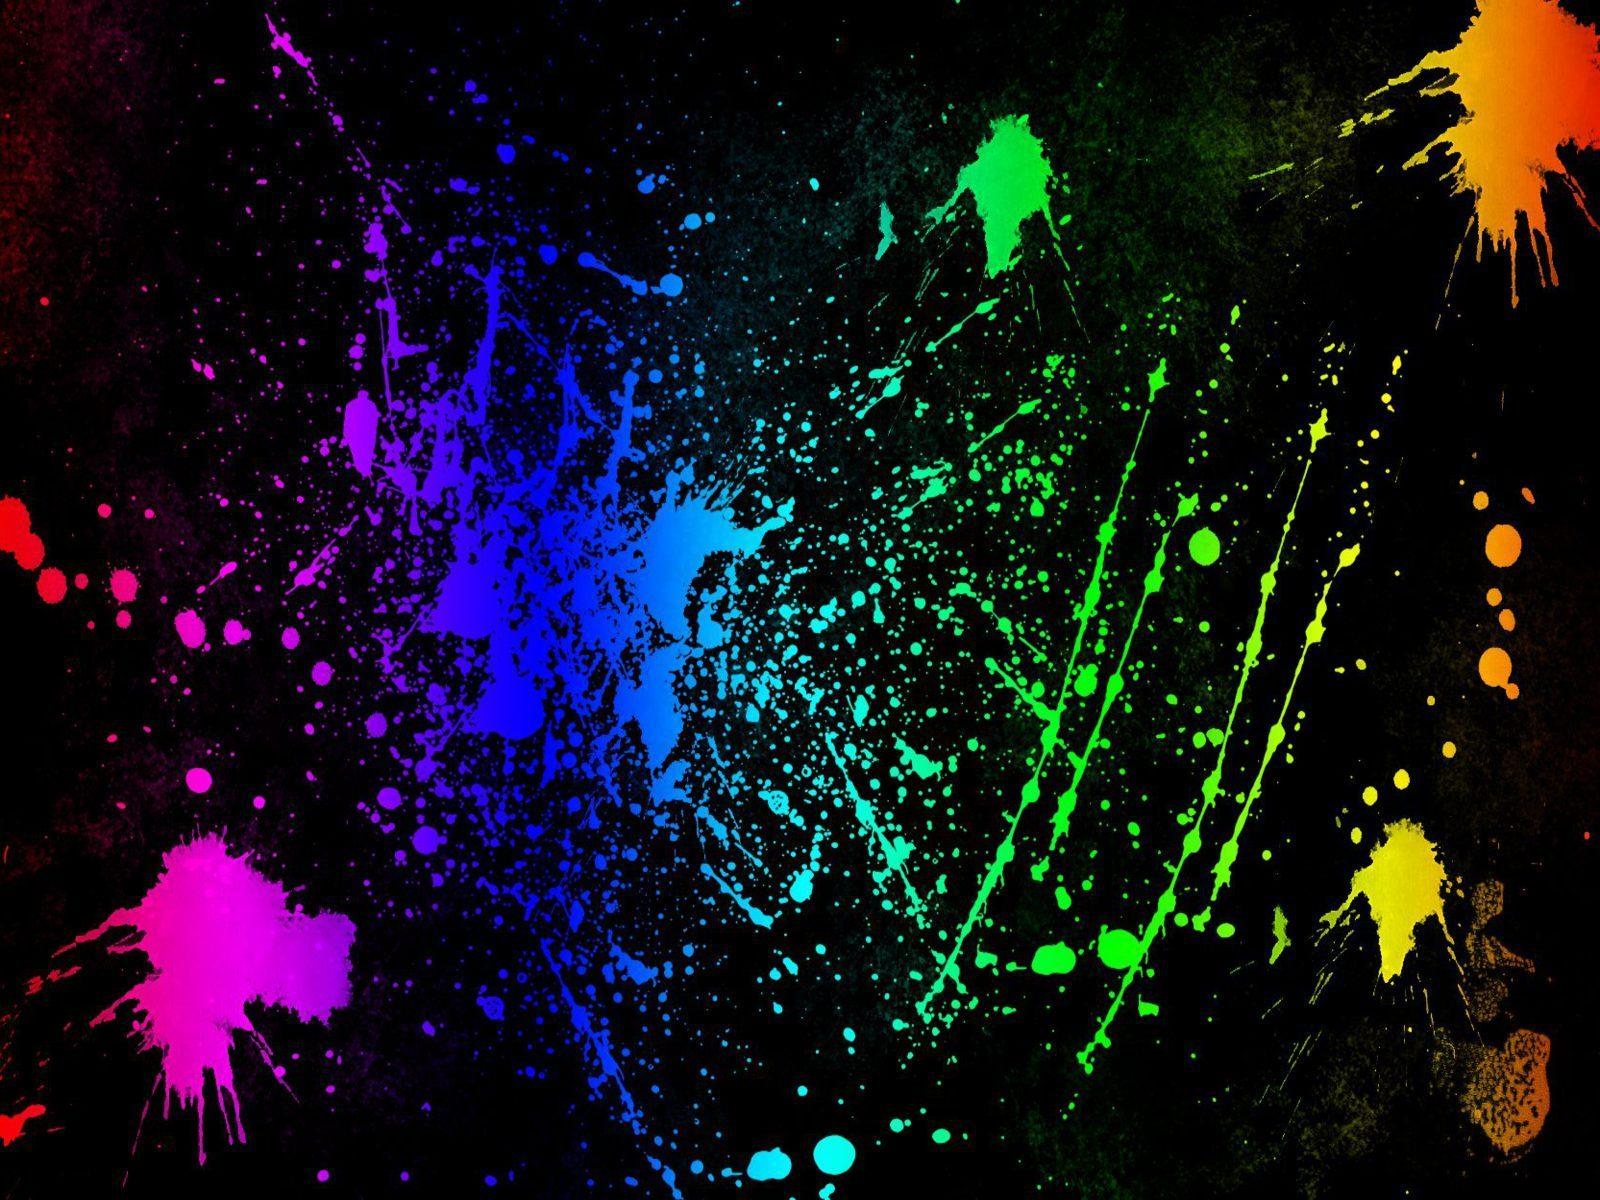 Neon Colors Rock images Splatter HD wallpaper and 1600x1200